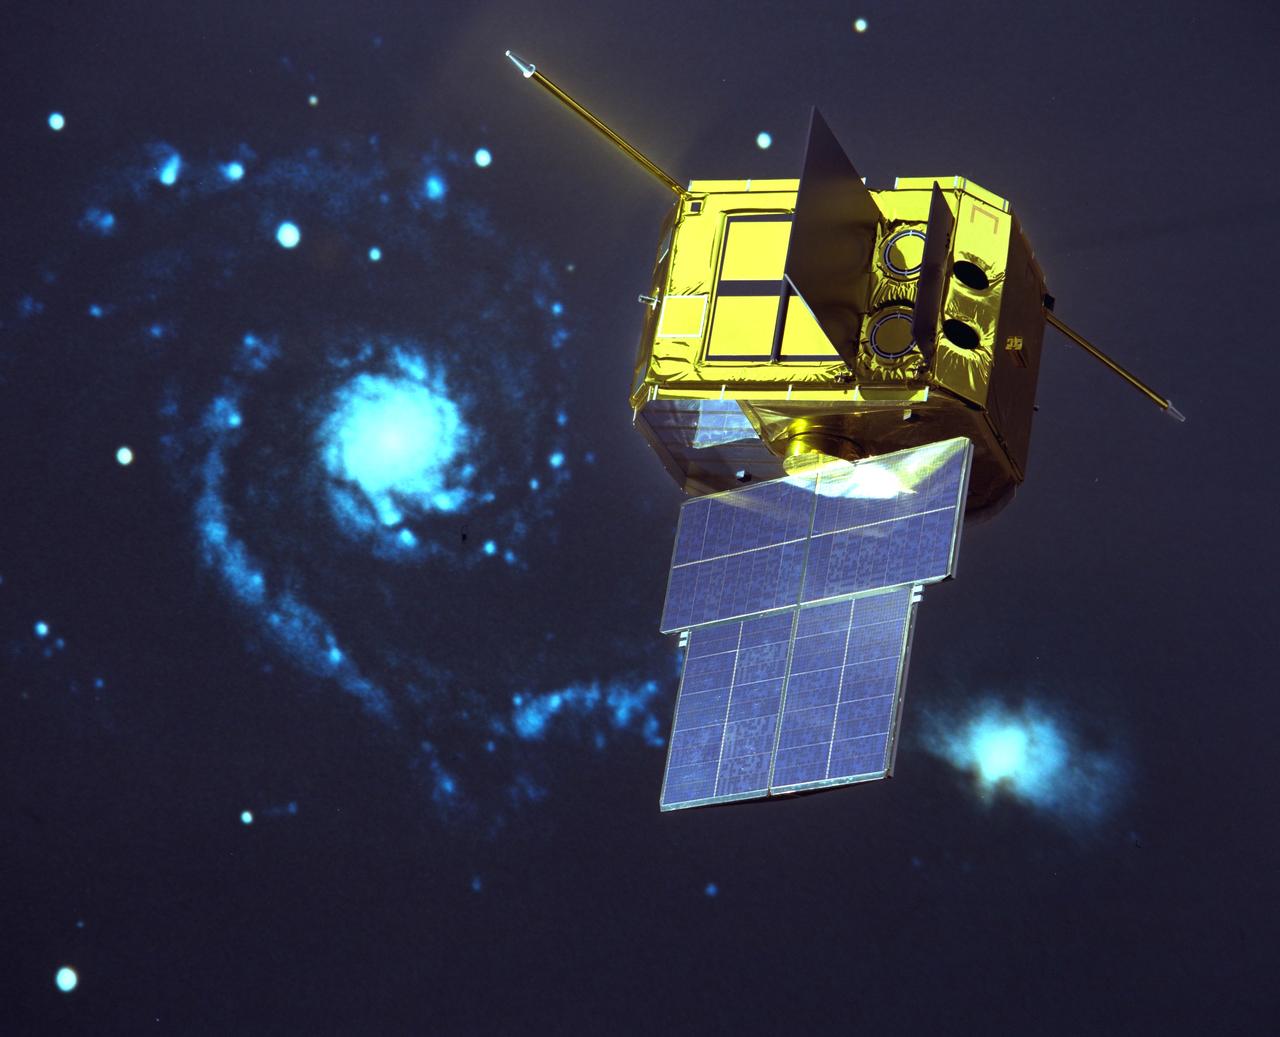 1567214320724-EXOSAT_mission_1280.jpg